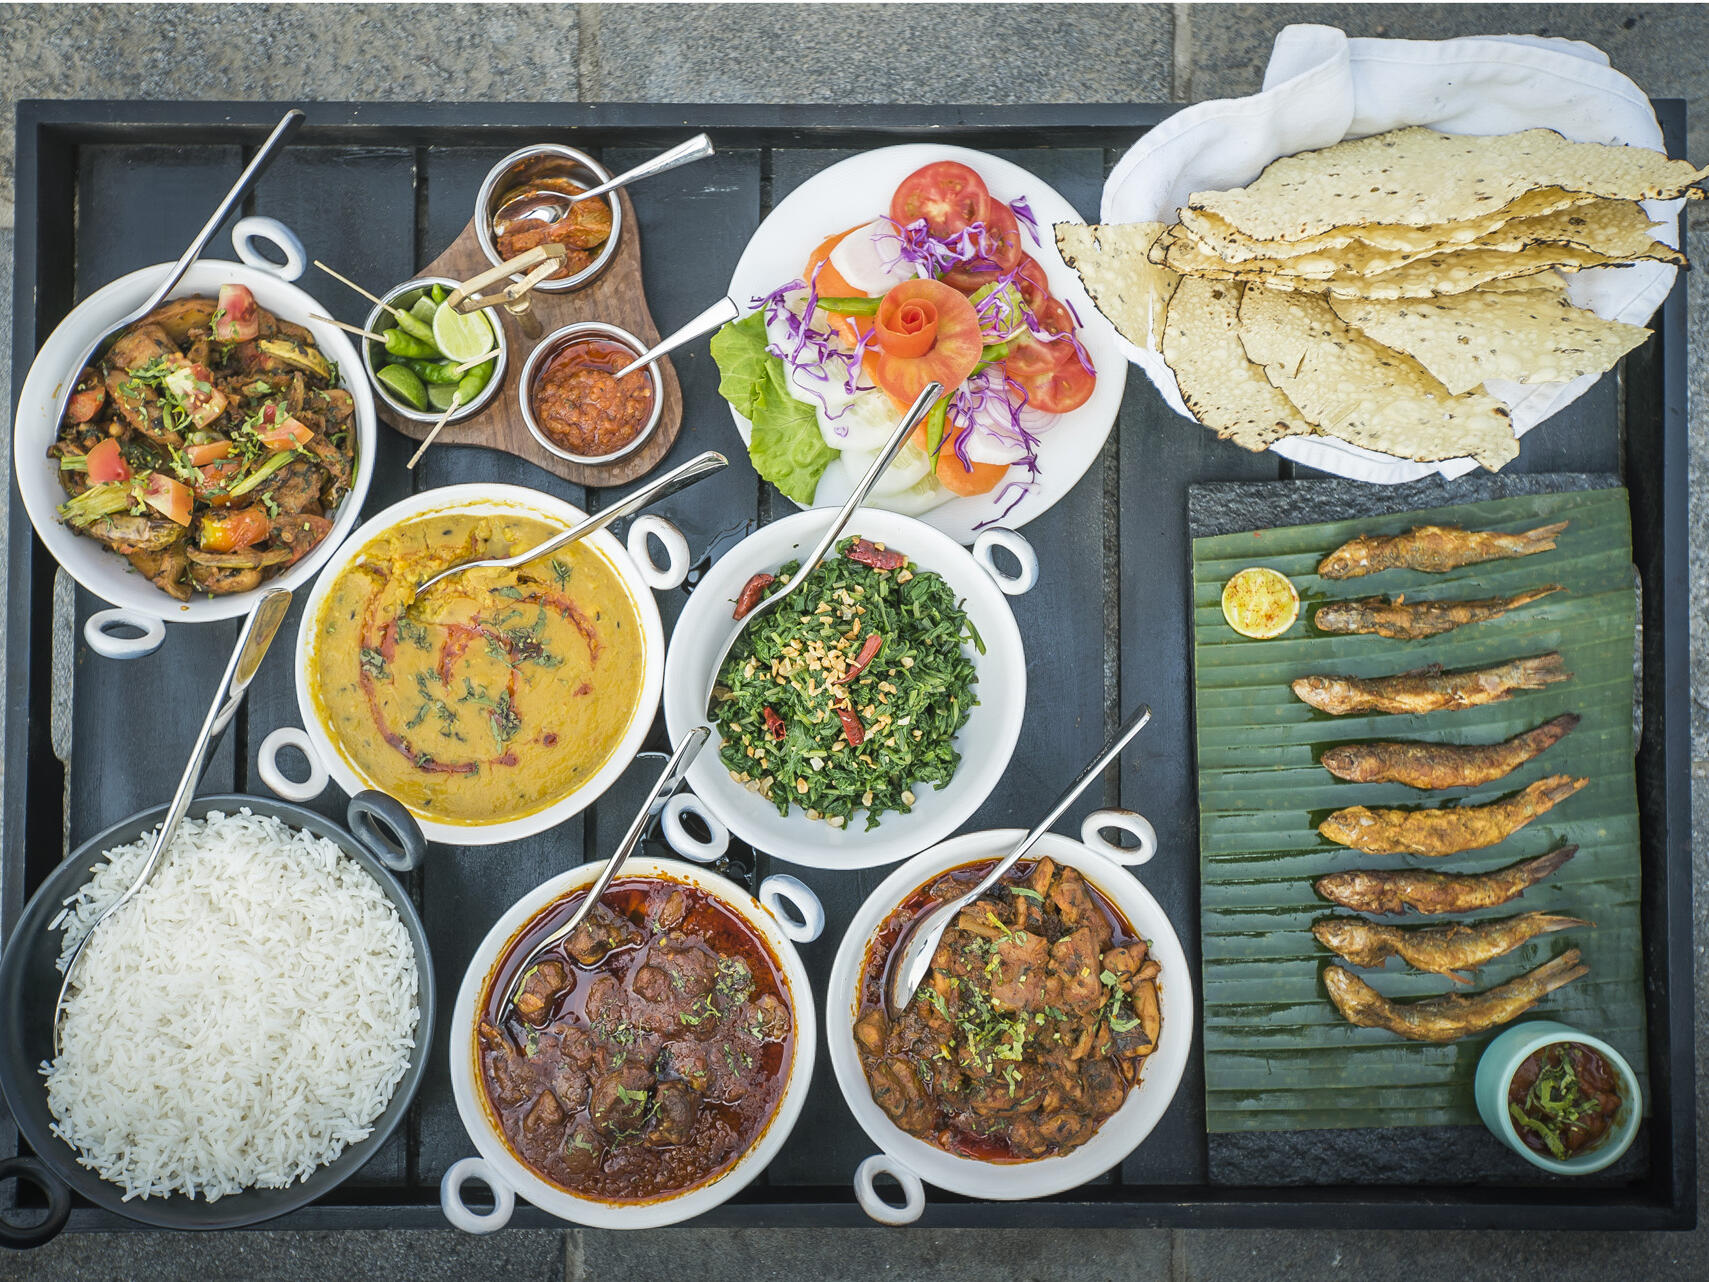 Tasty lunch table at Meghauli Serai